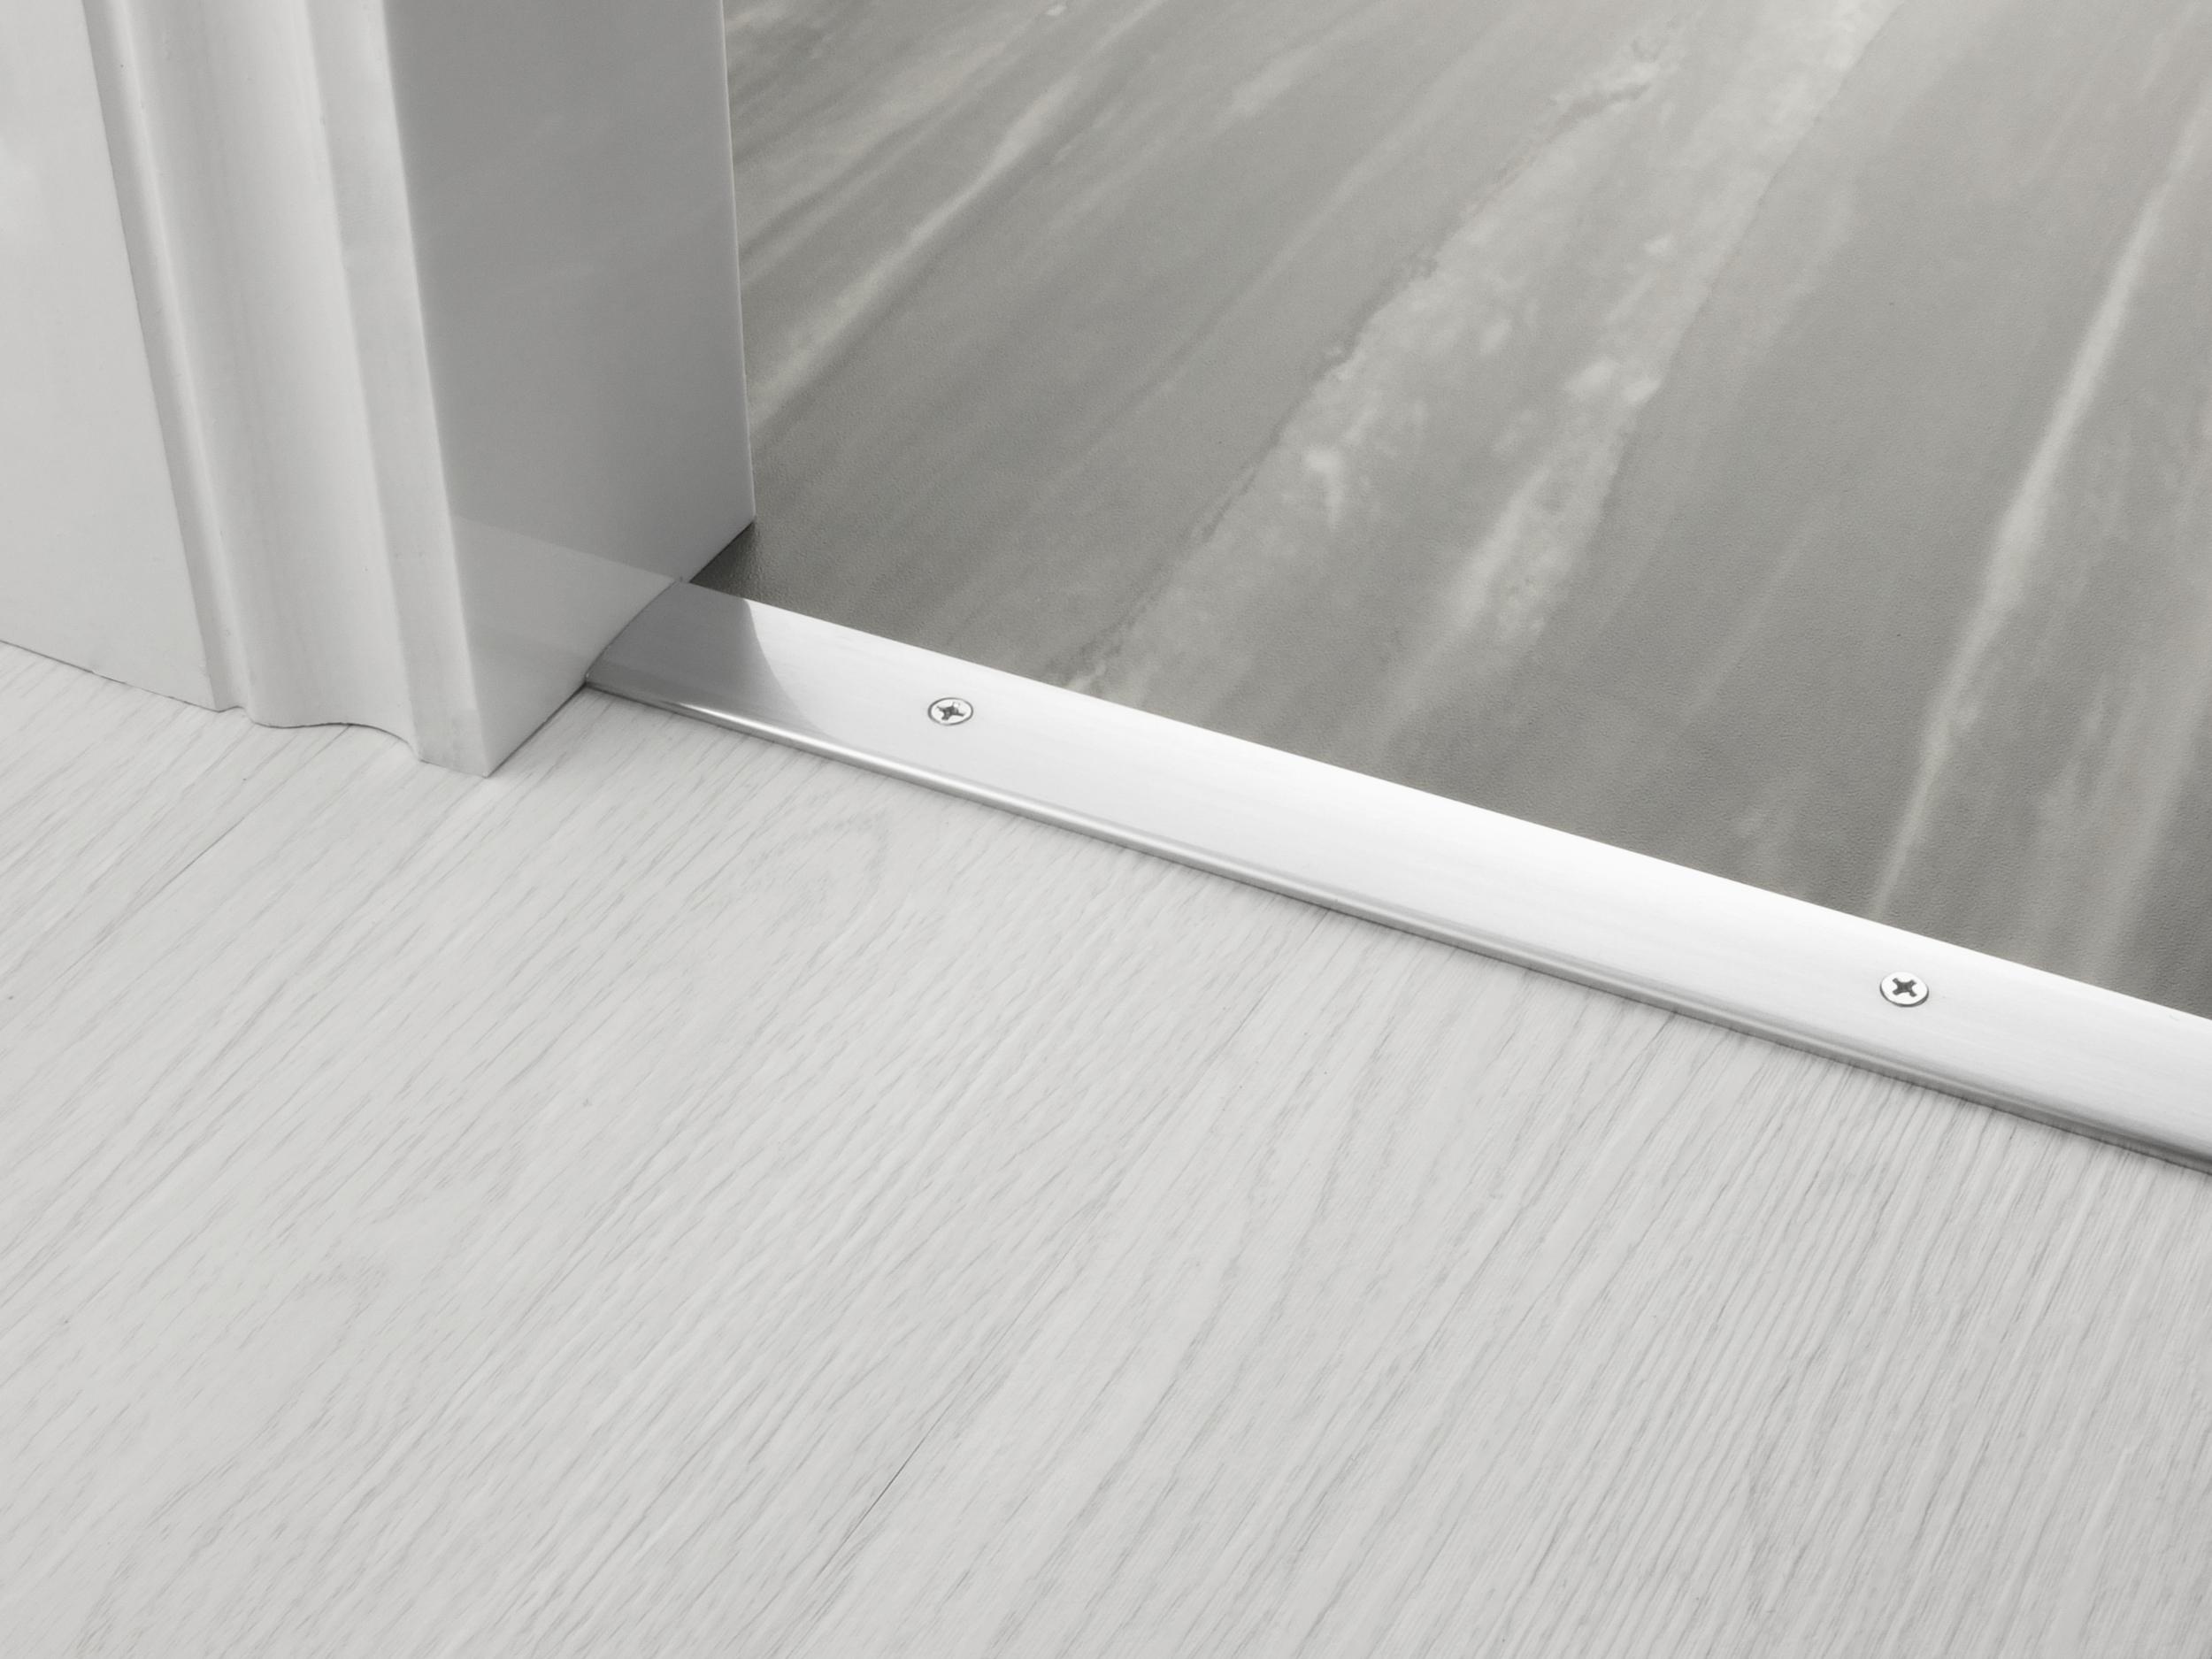 door_bar_cover-30mm_h2h_brushed_chrome.jpg